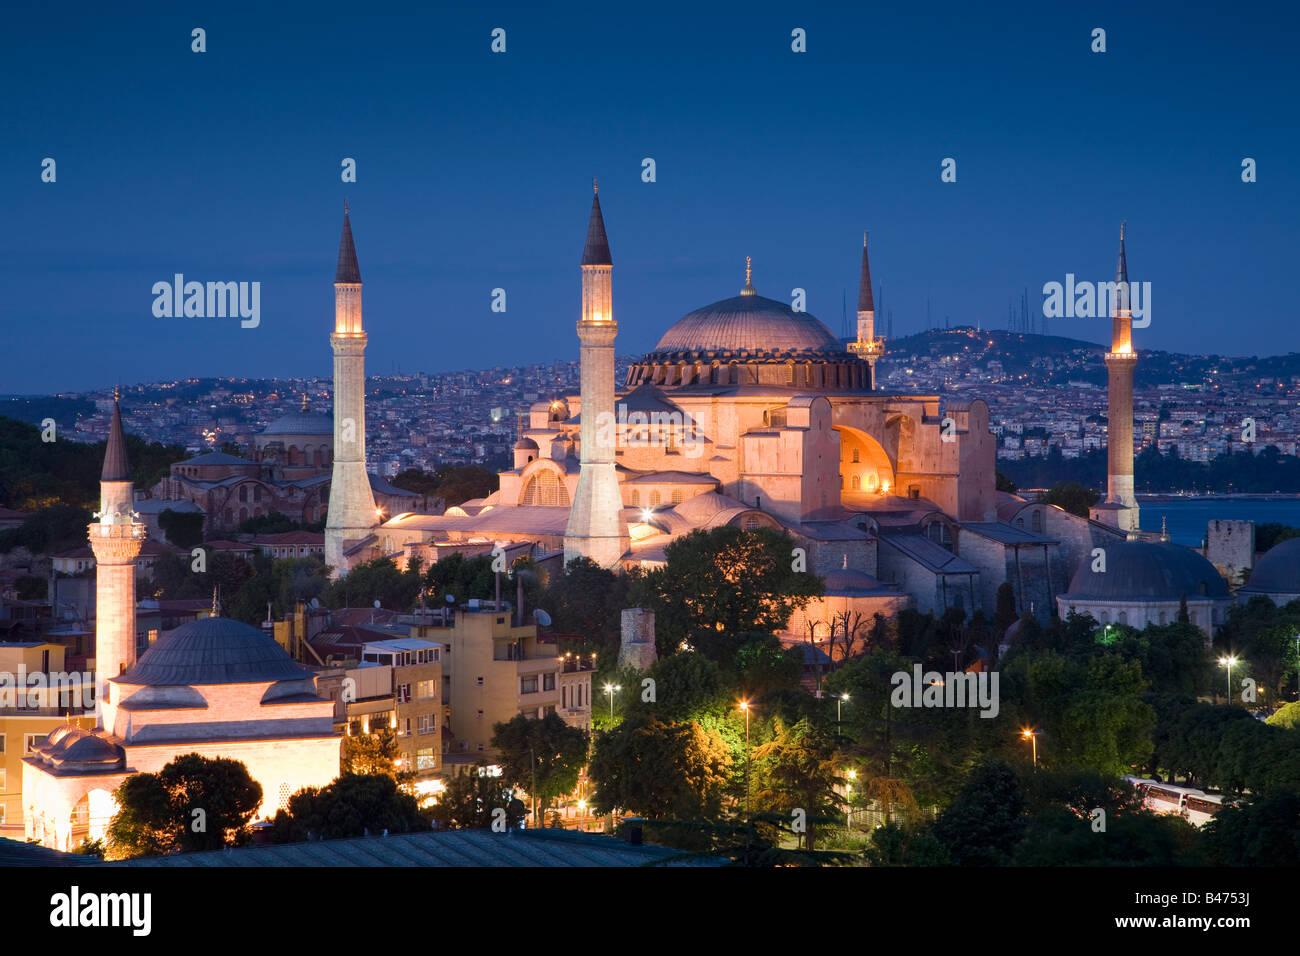 Türkei Istanbul erhöhten Blick auf die Hagia Sophia Mosque Stockbild